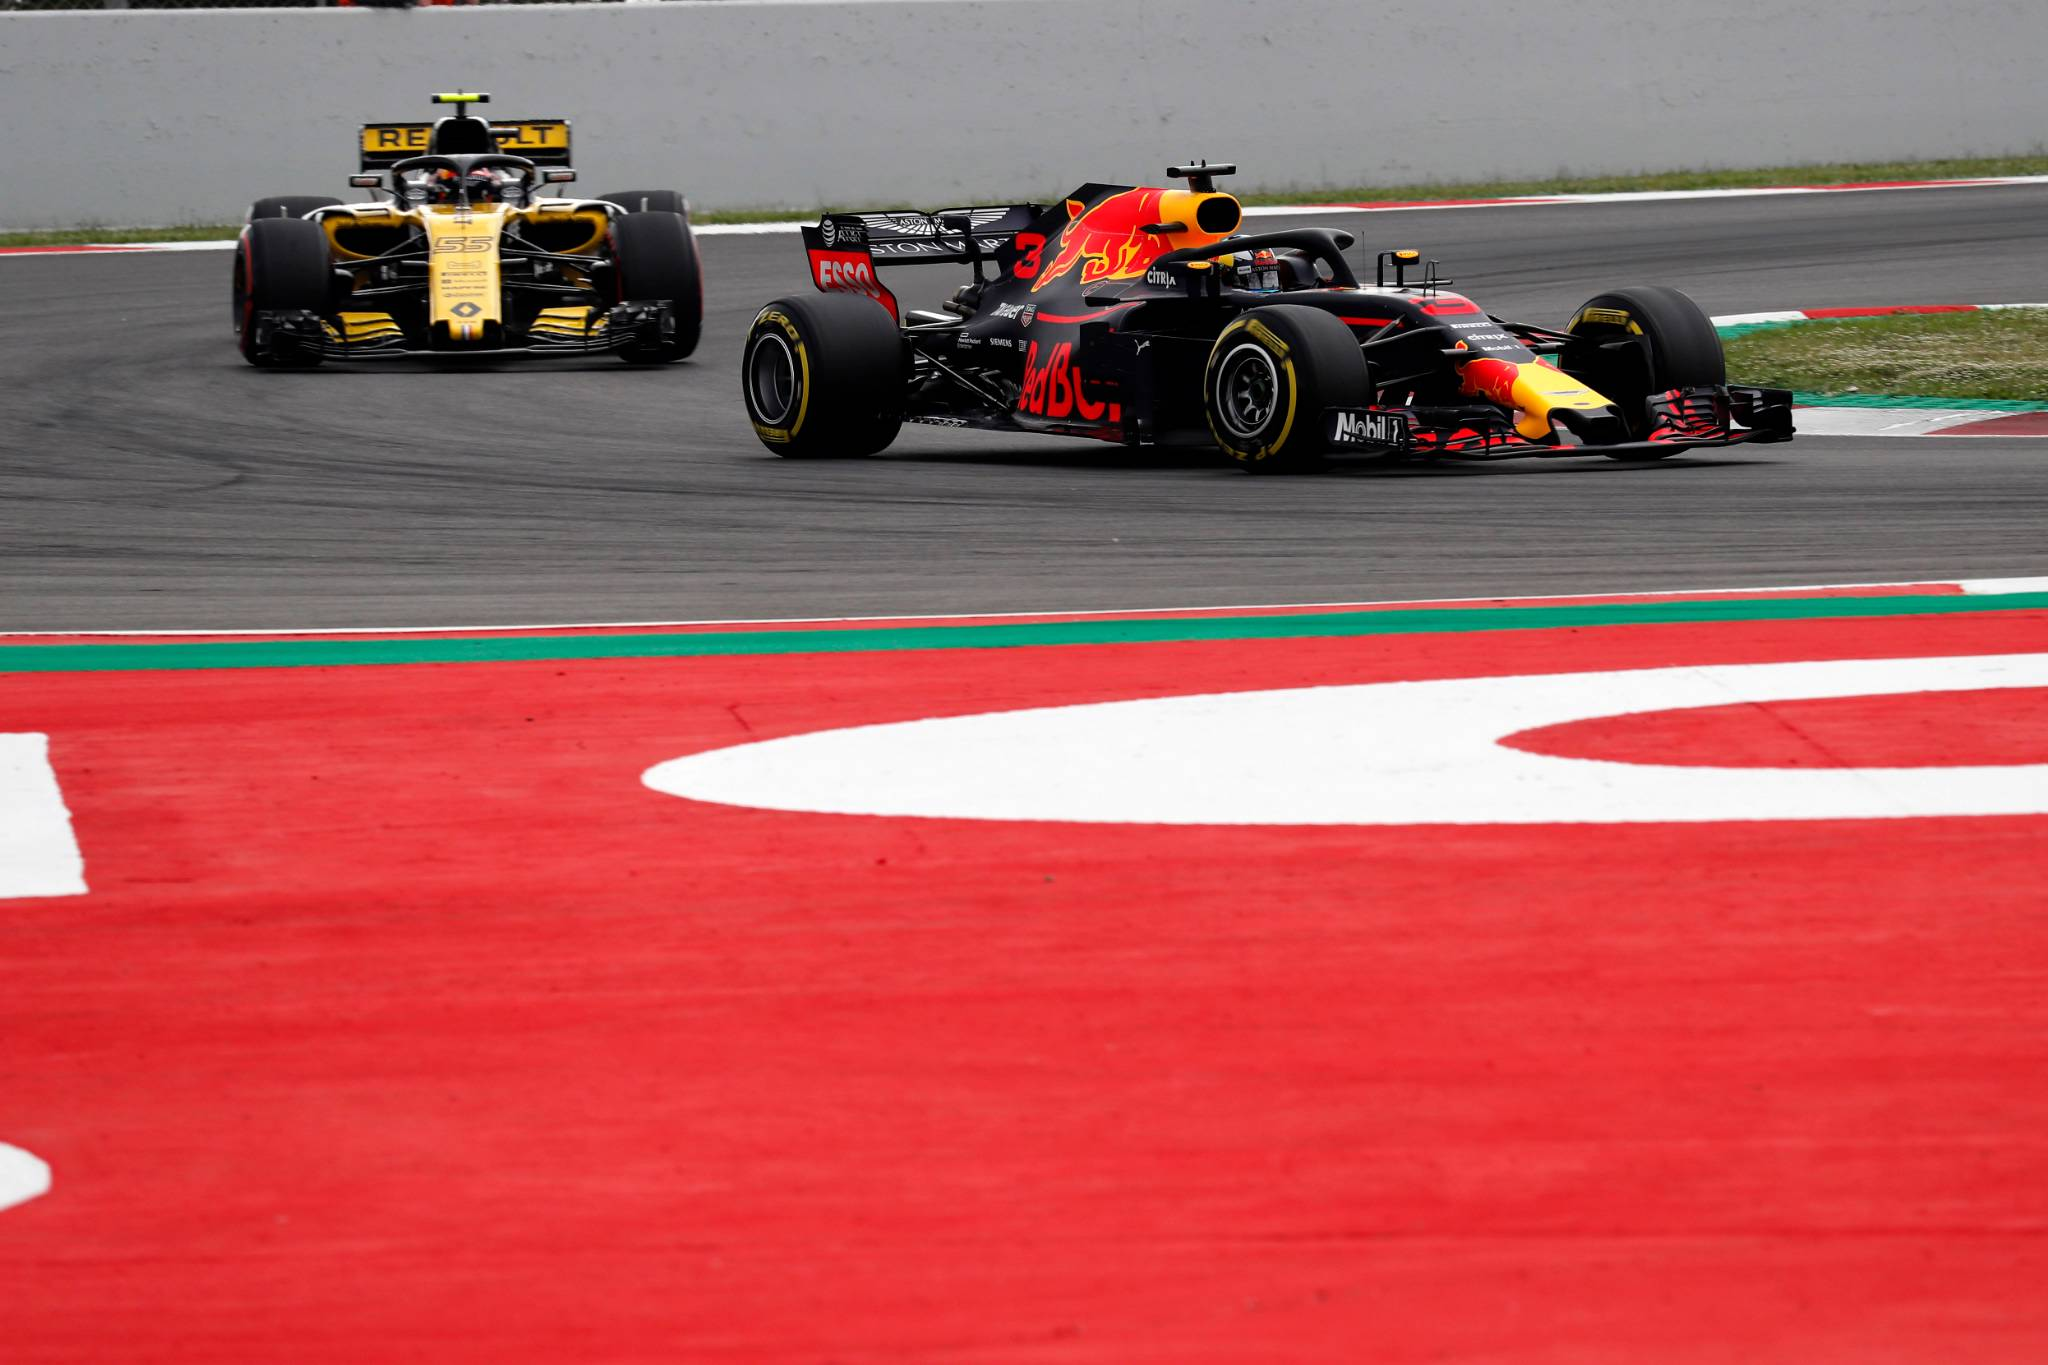 12.05.2018 - Qualifying, Carlos Sainz Jr (ESP) Renault Sport F1 Team RS18 and Daniel Ricciardo (AUS) Red Bull Racing RB14